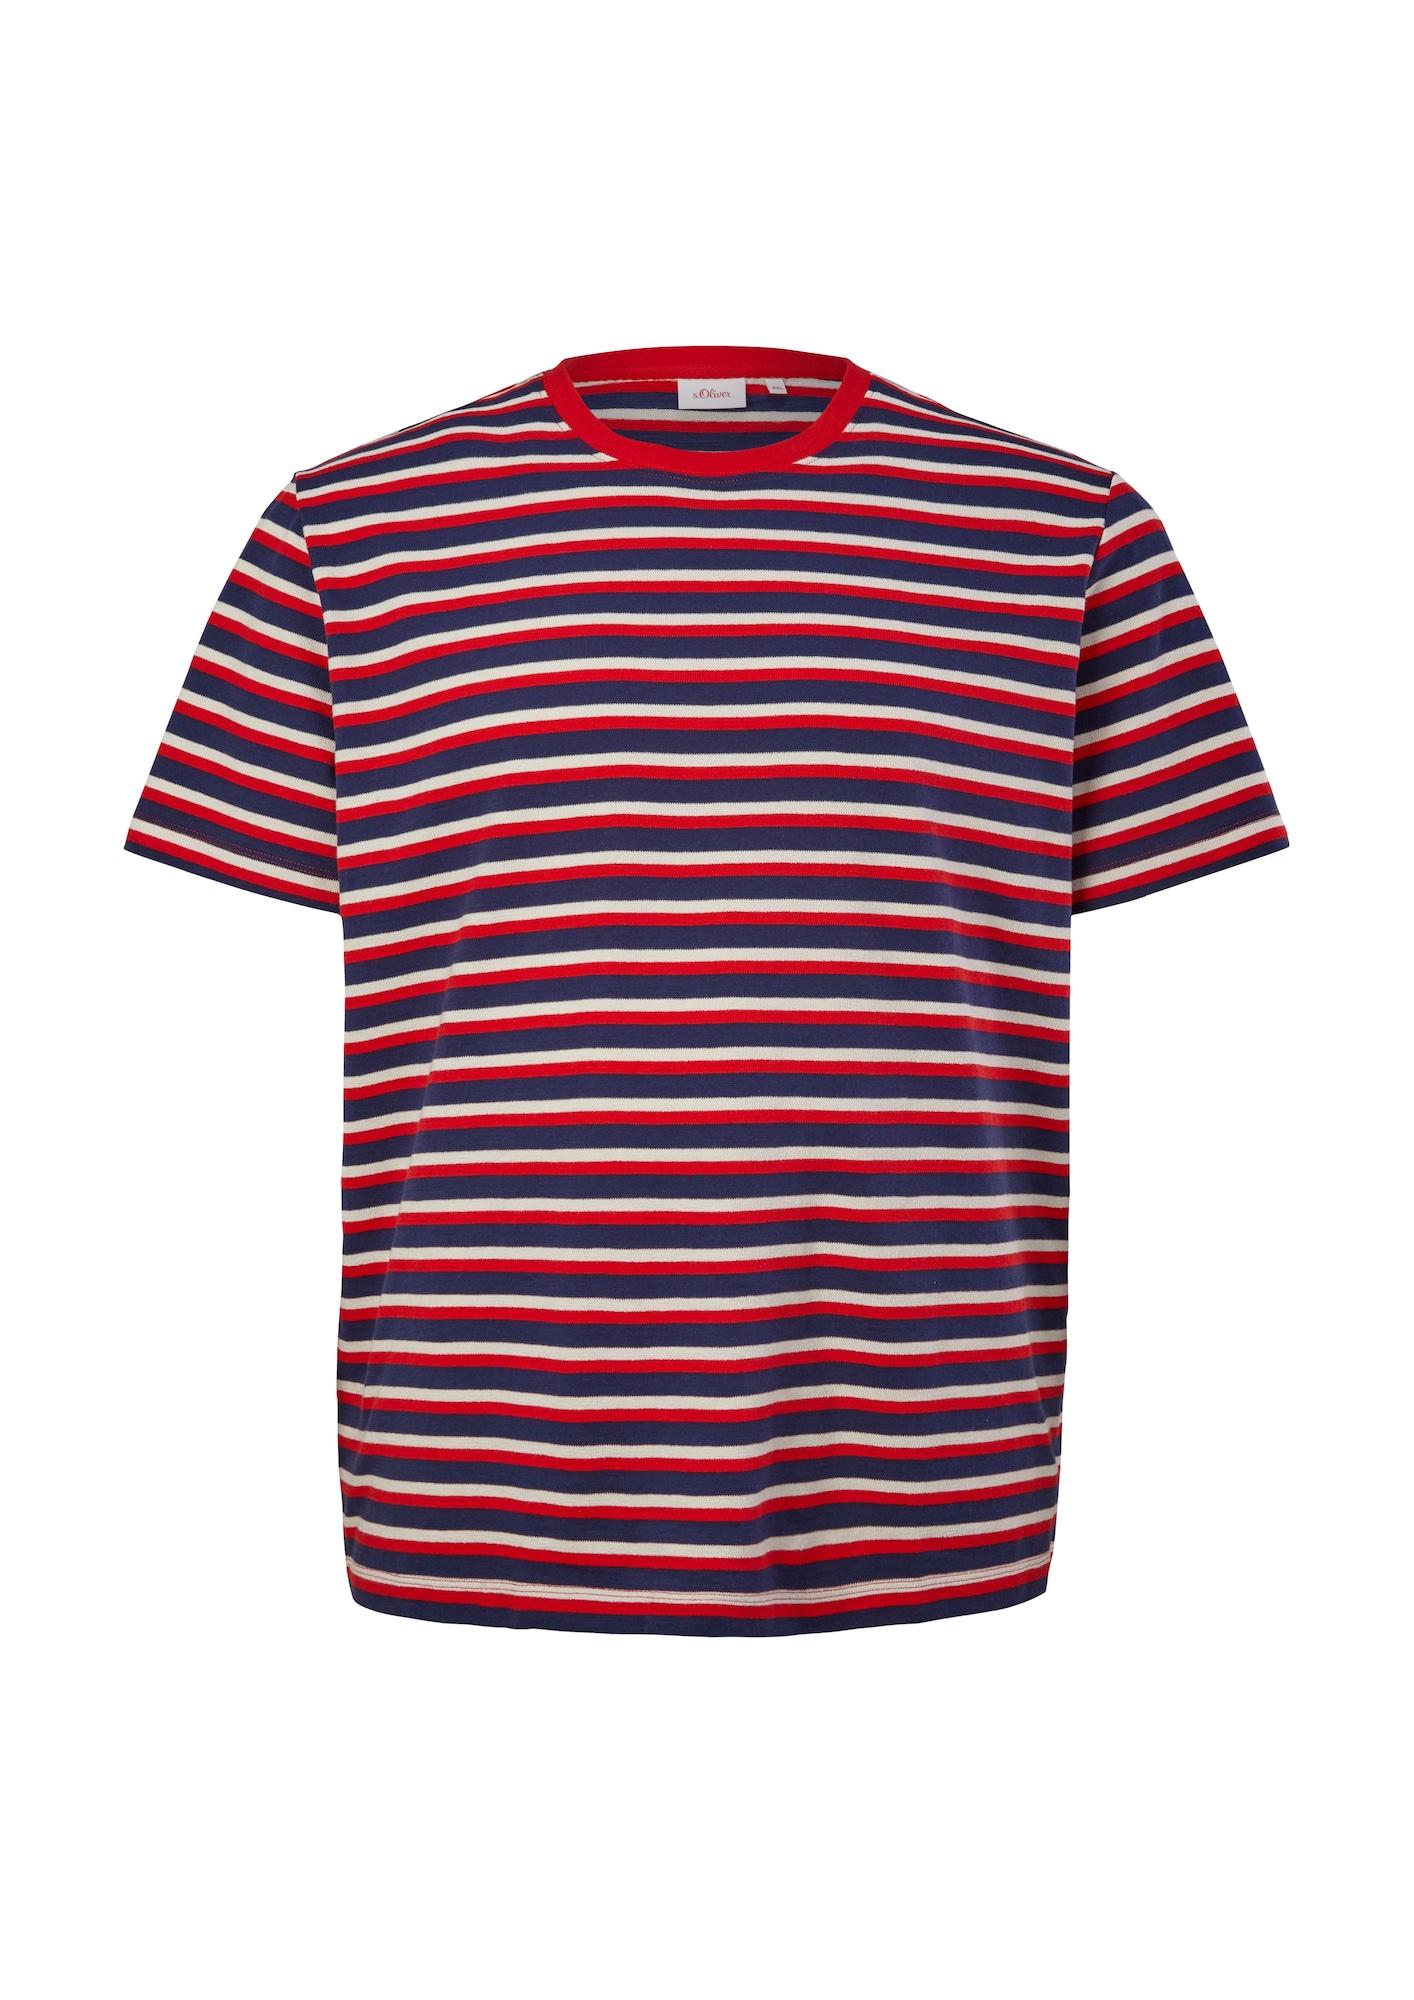 s.Oliver Red Label Big & Tall Marškinėliai raudona / mėlyna / balta